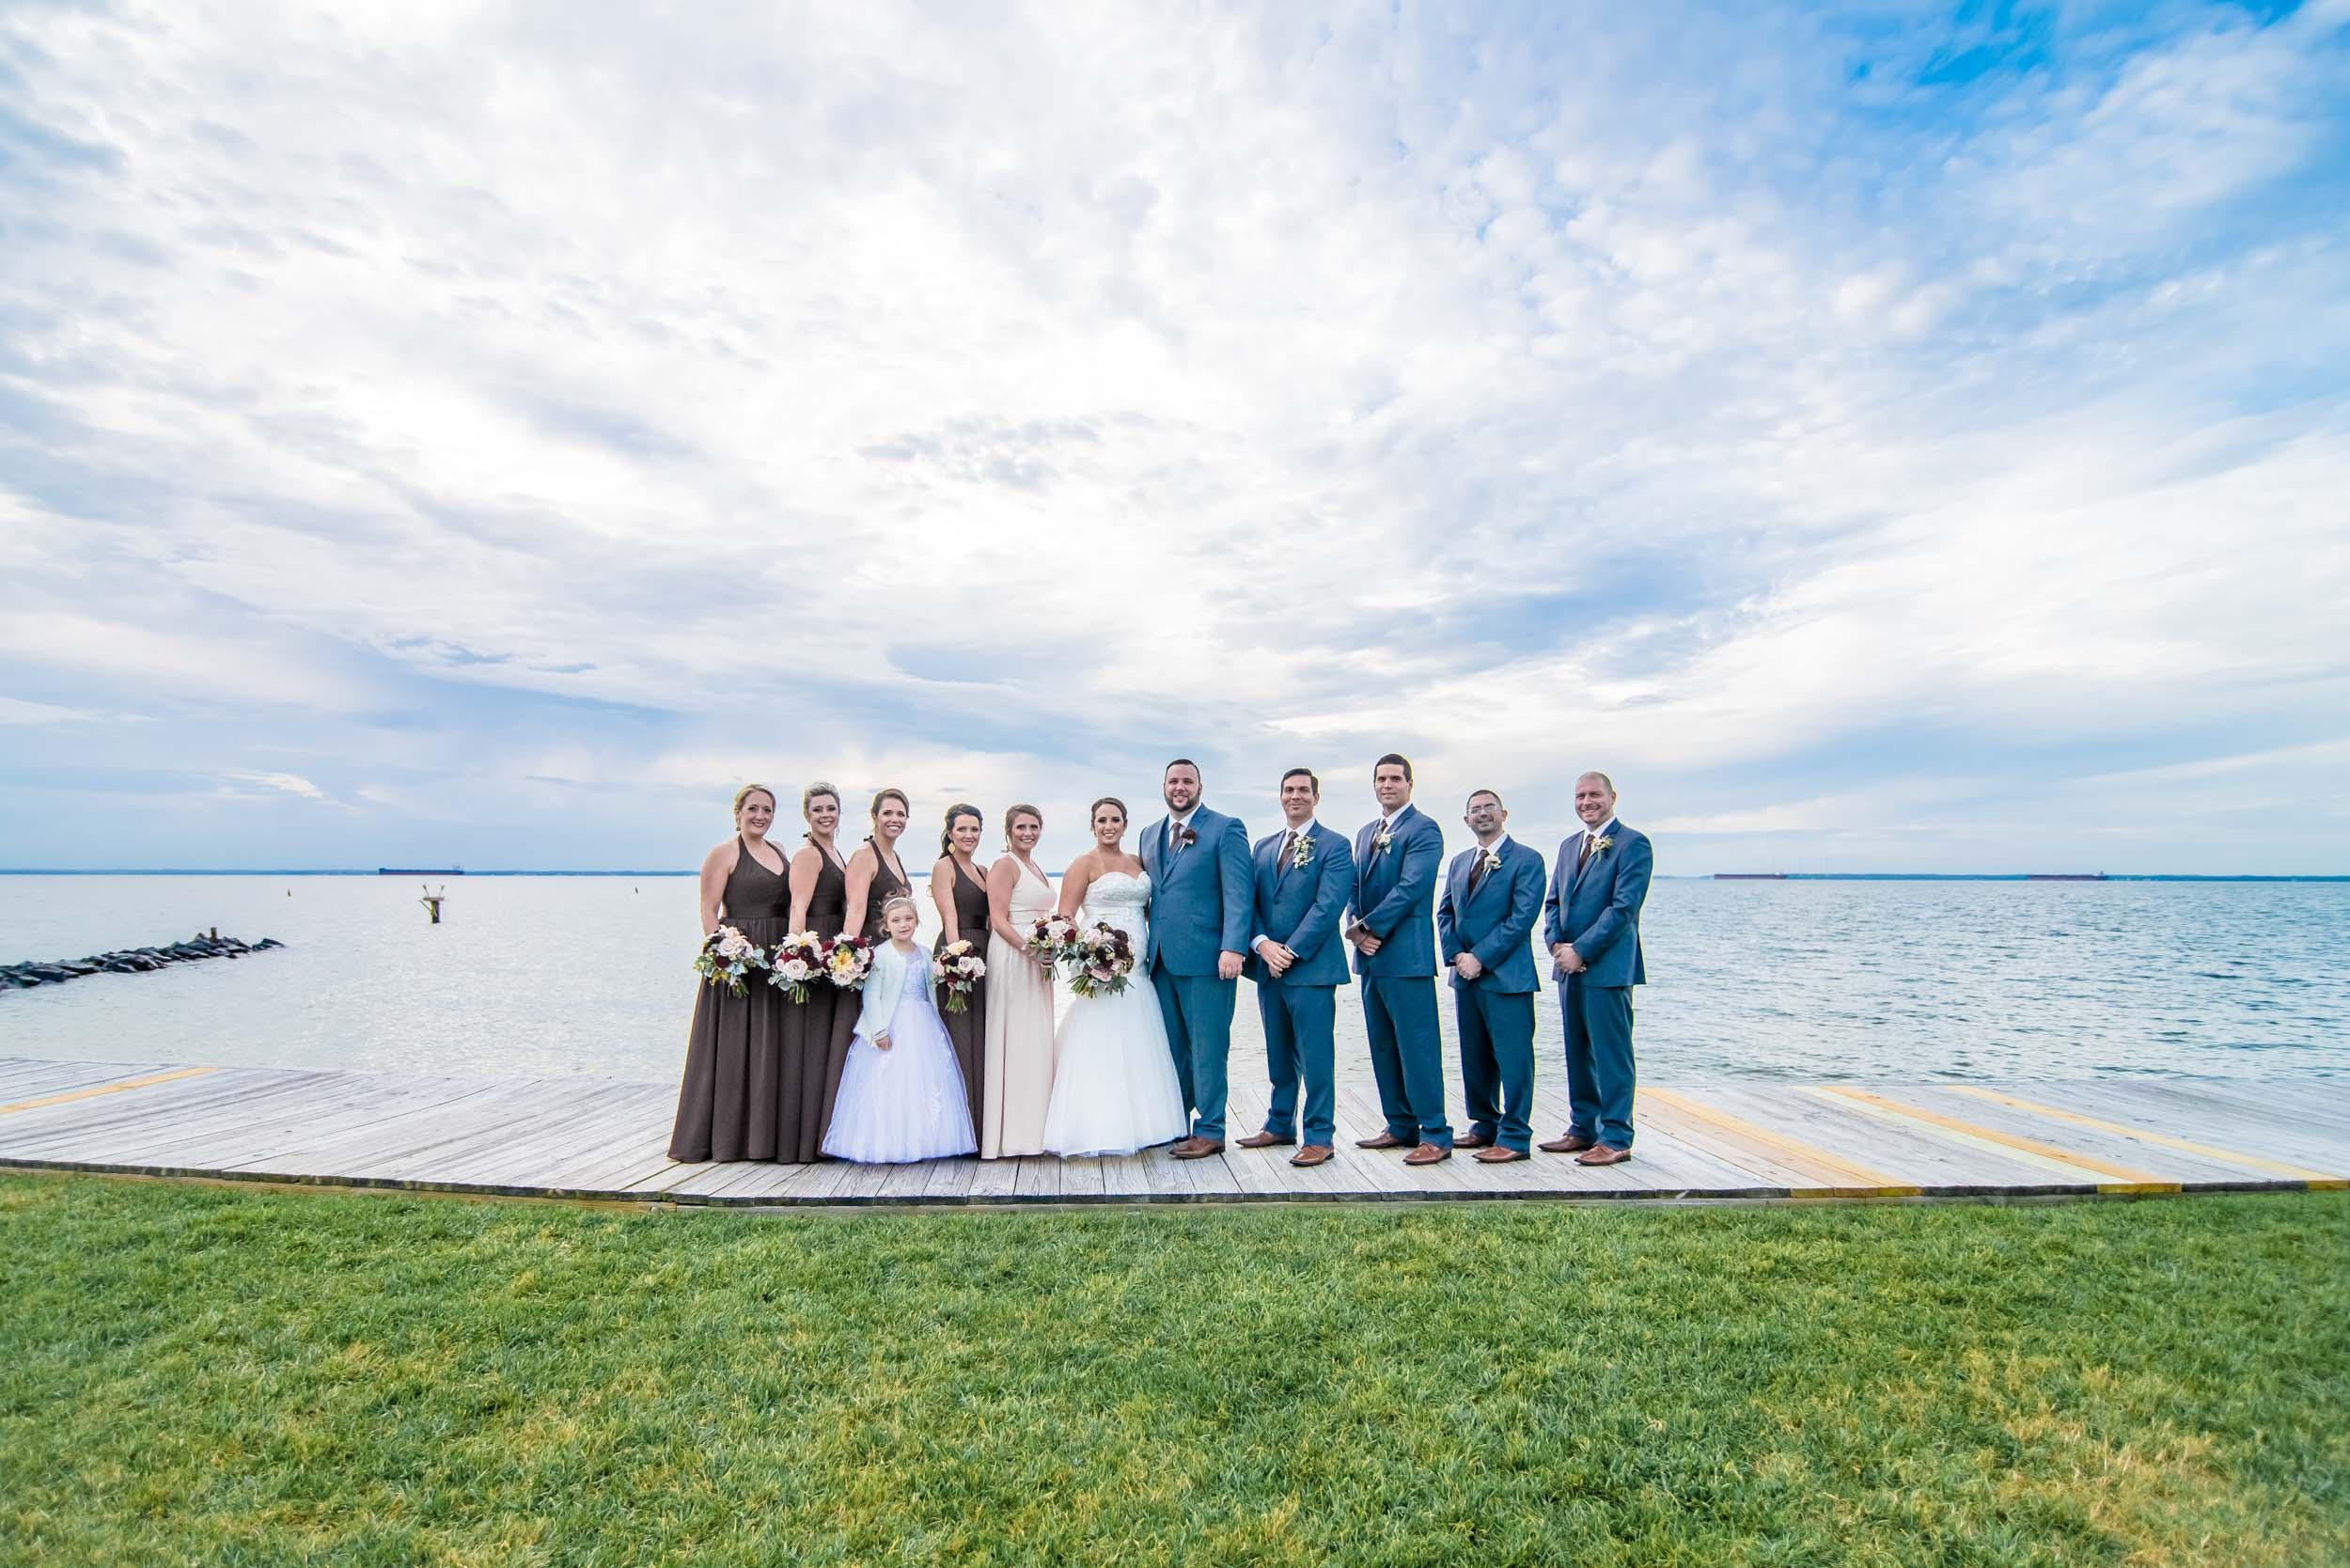 dc+metro+wedding+photographer+vadym+guliuk+photography+wedding+party-2026.jpg